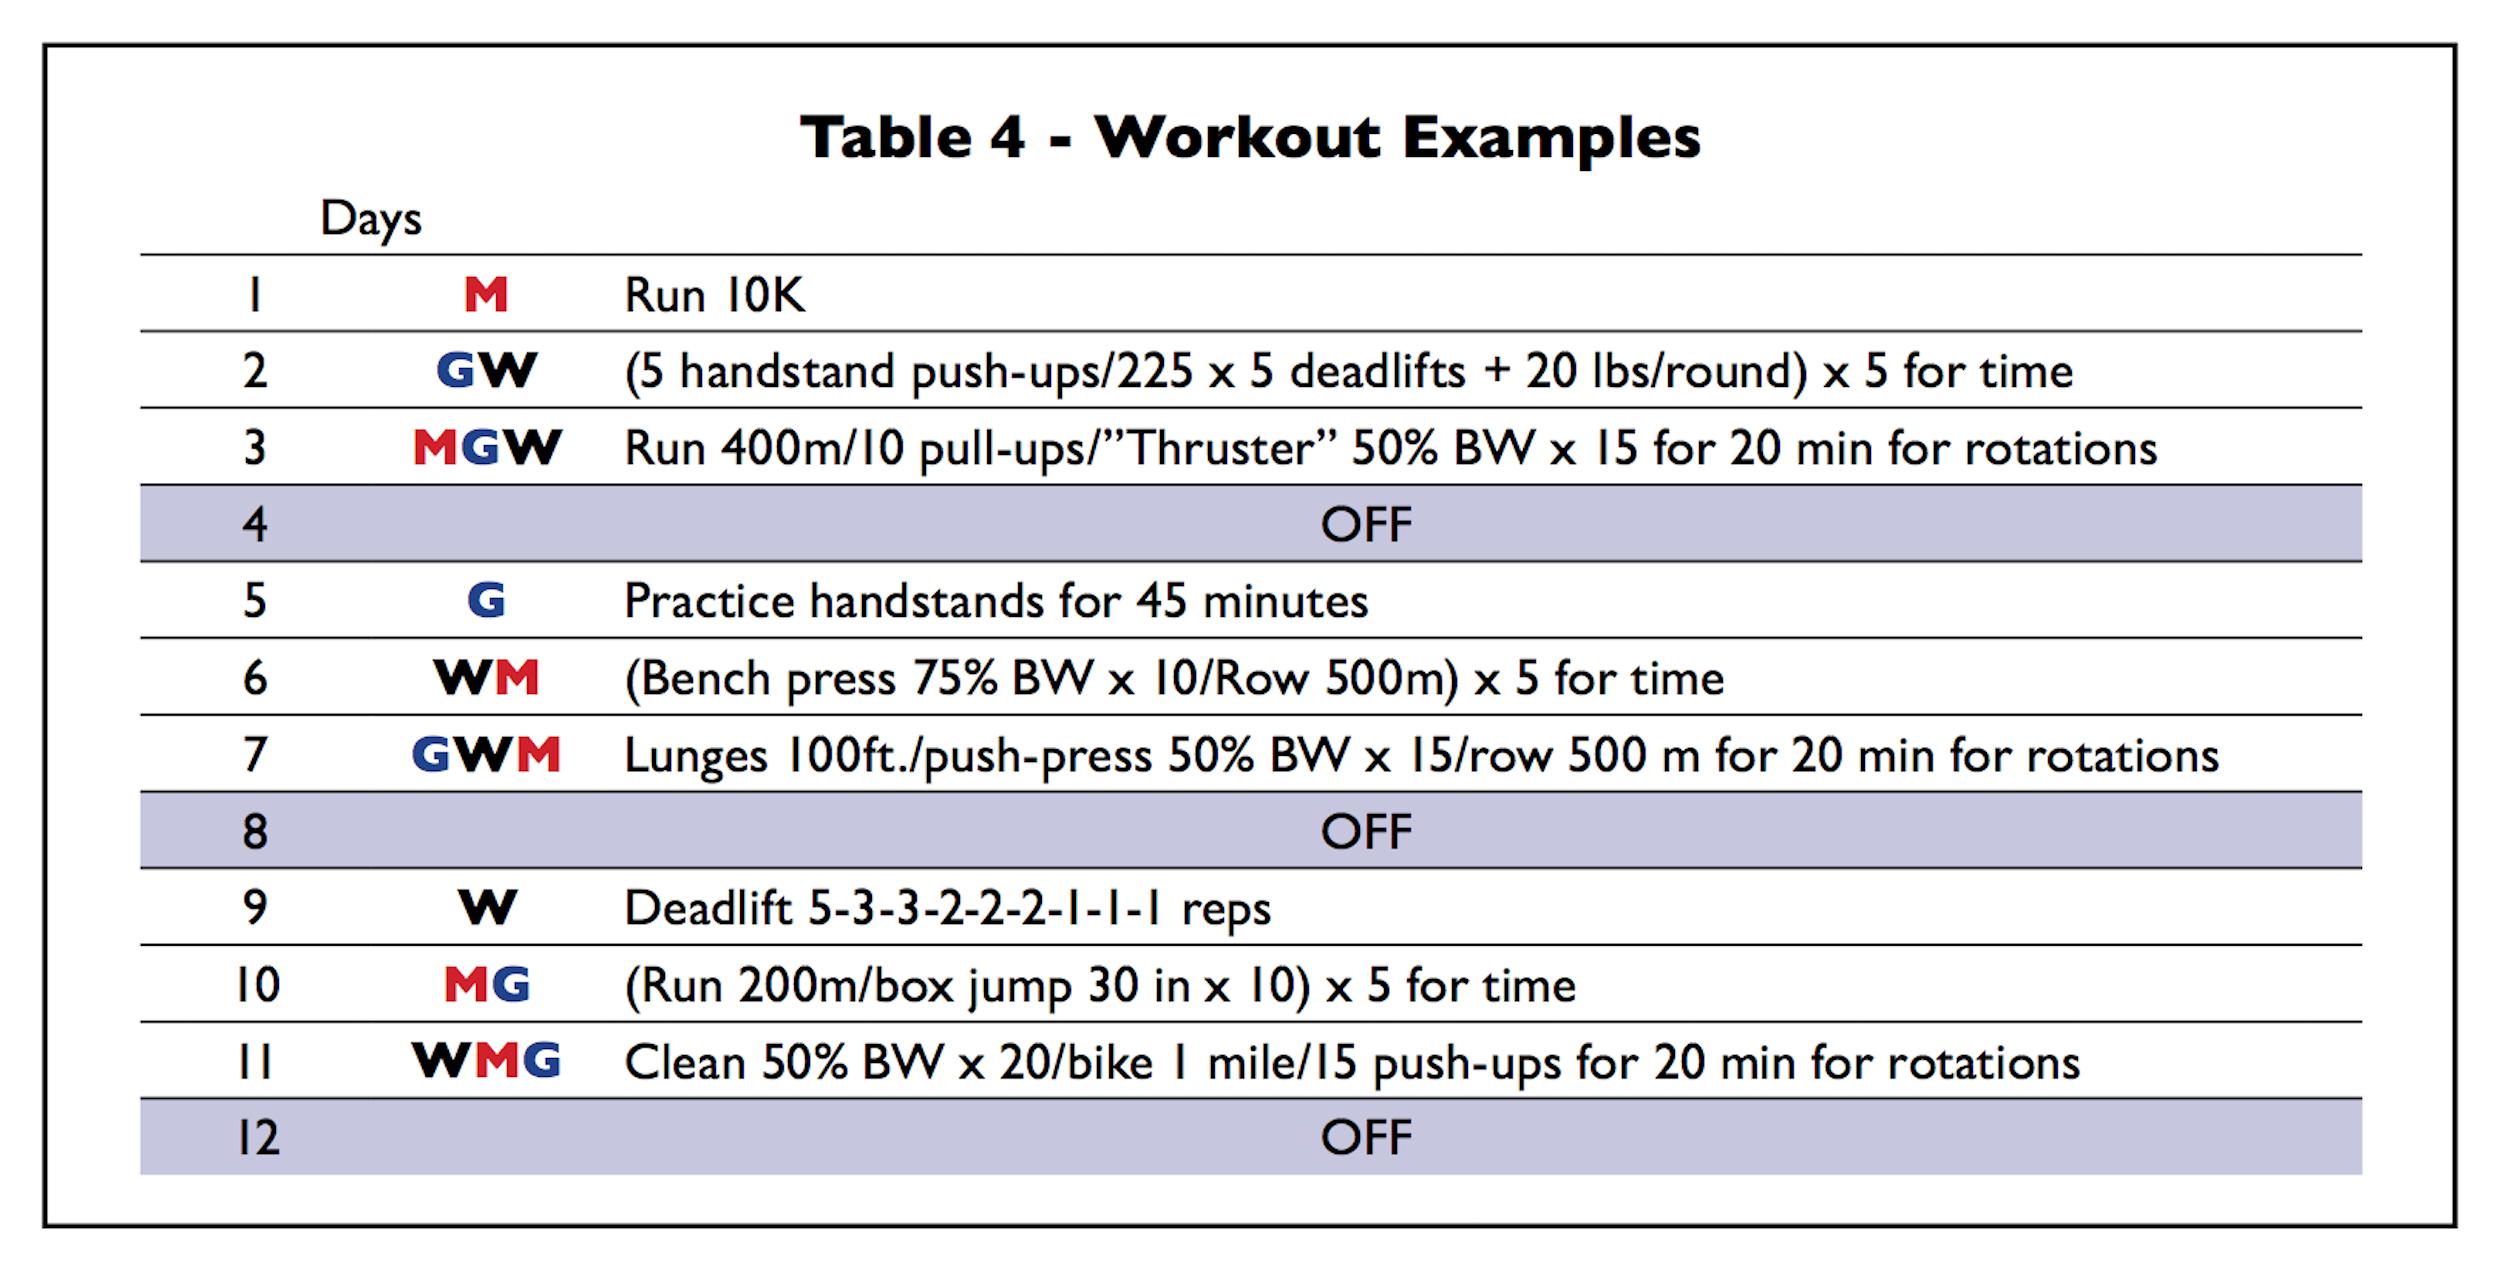 Article - CrossFit: Forging Elite Fitness